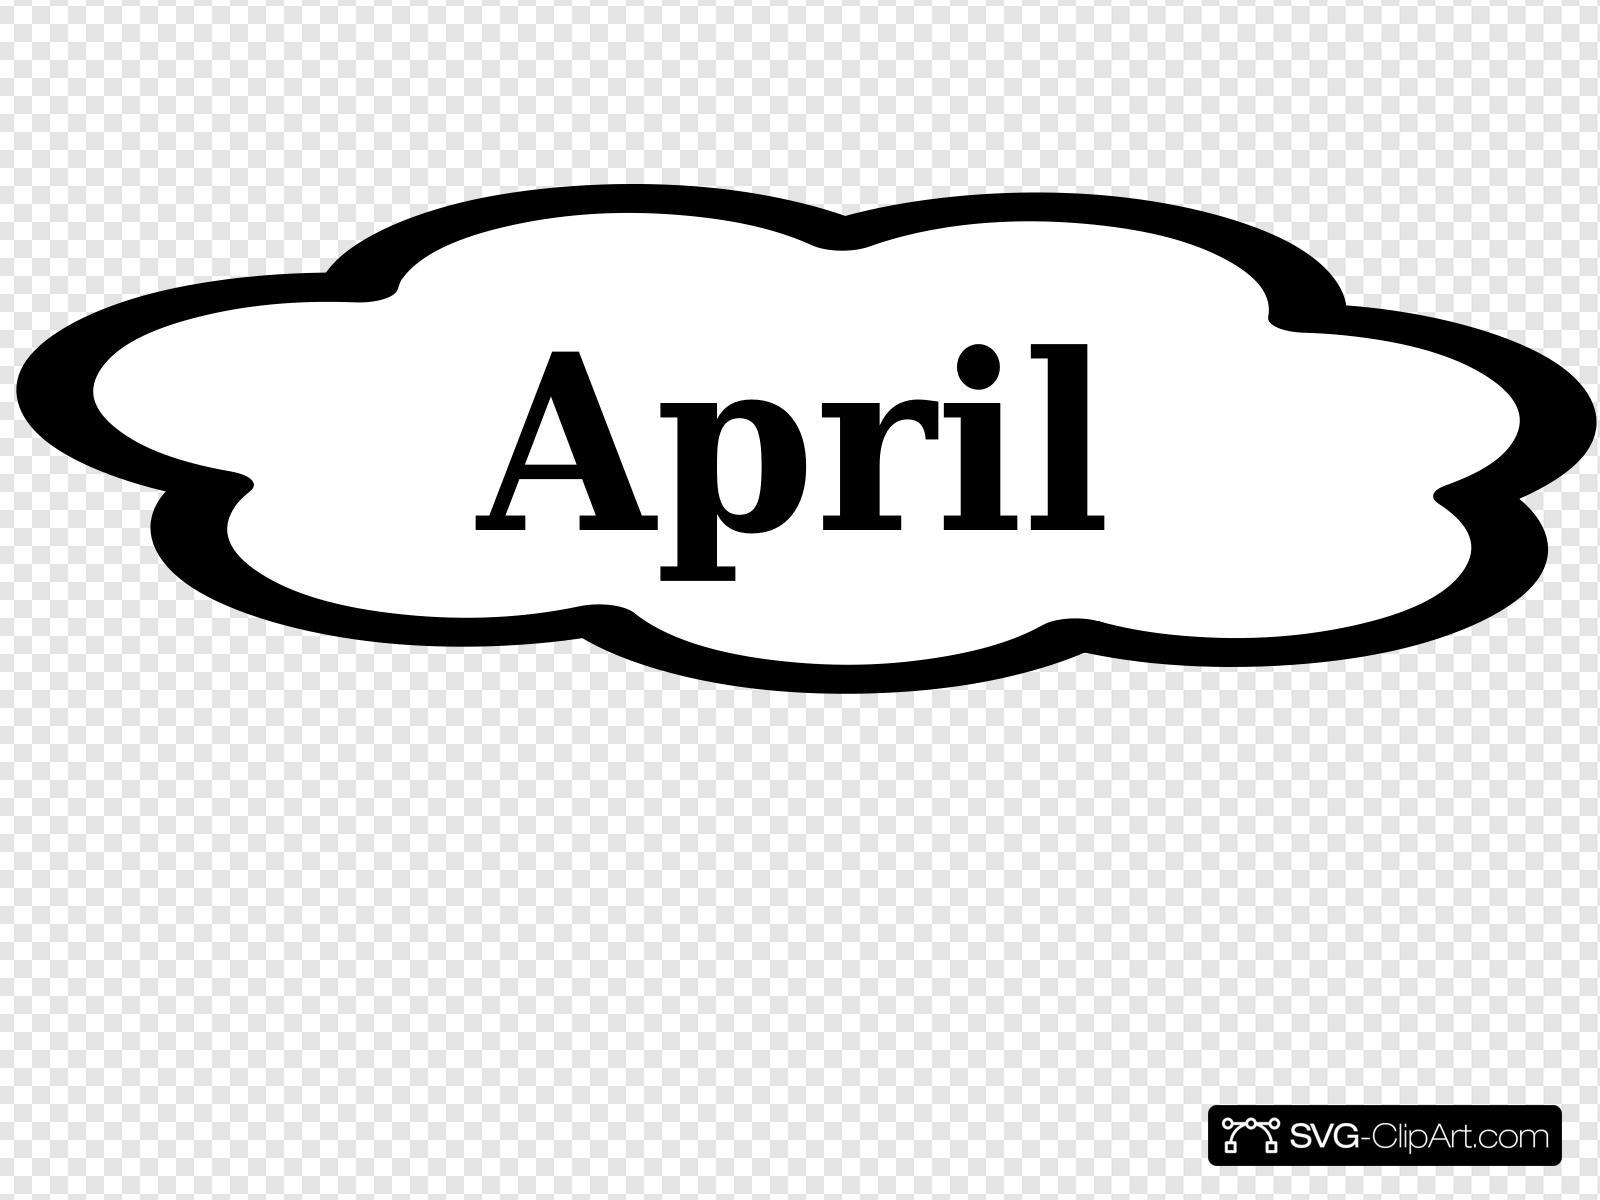 April Calendar Sign Clip art, Icon and SVG.